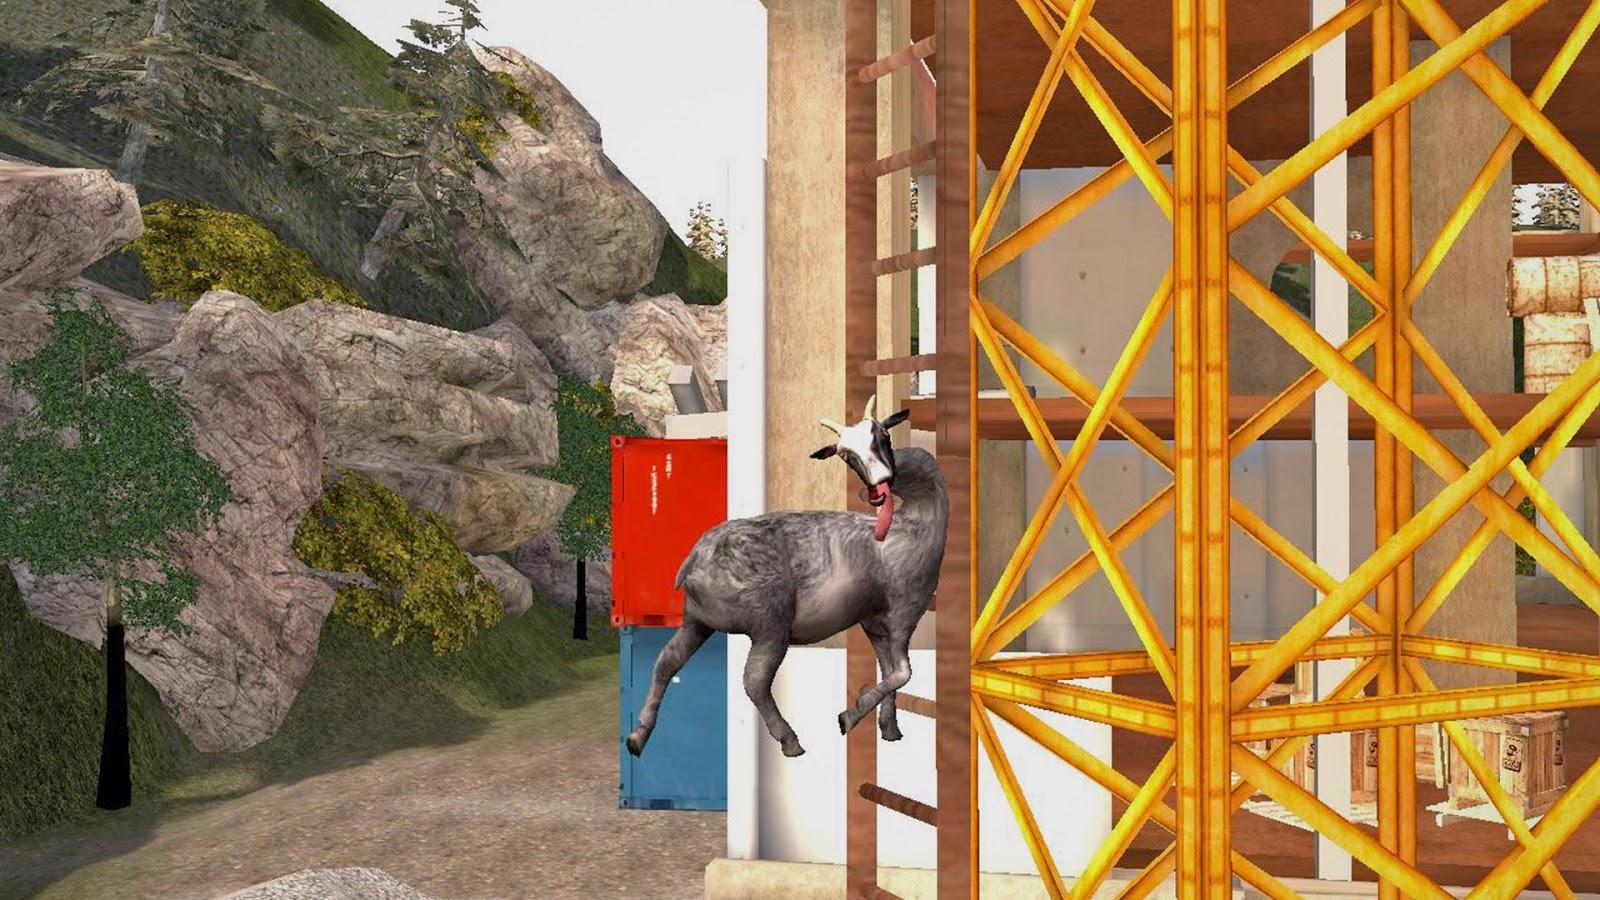 Goat Simulator v1.4.19+ + data